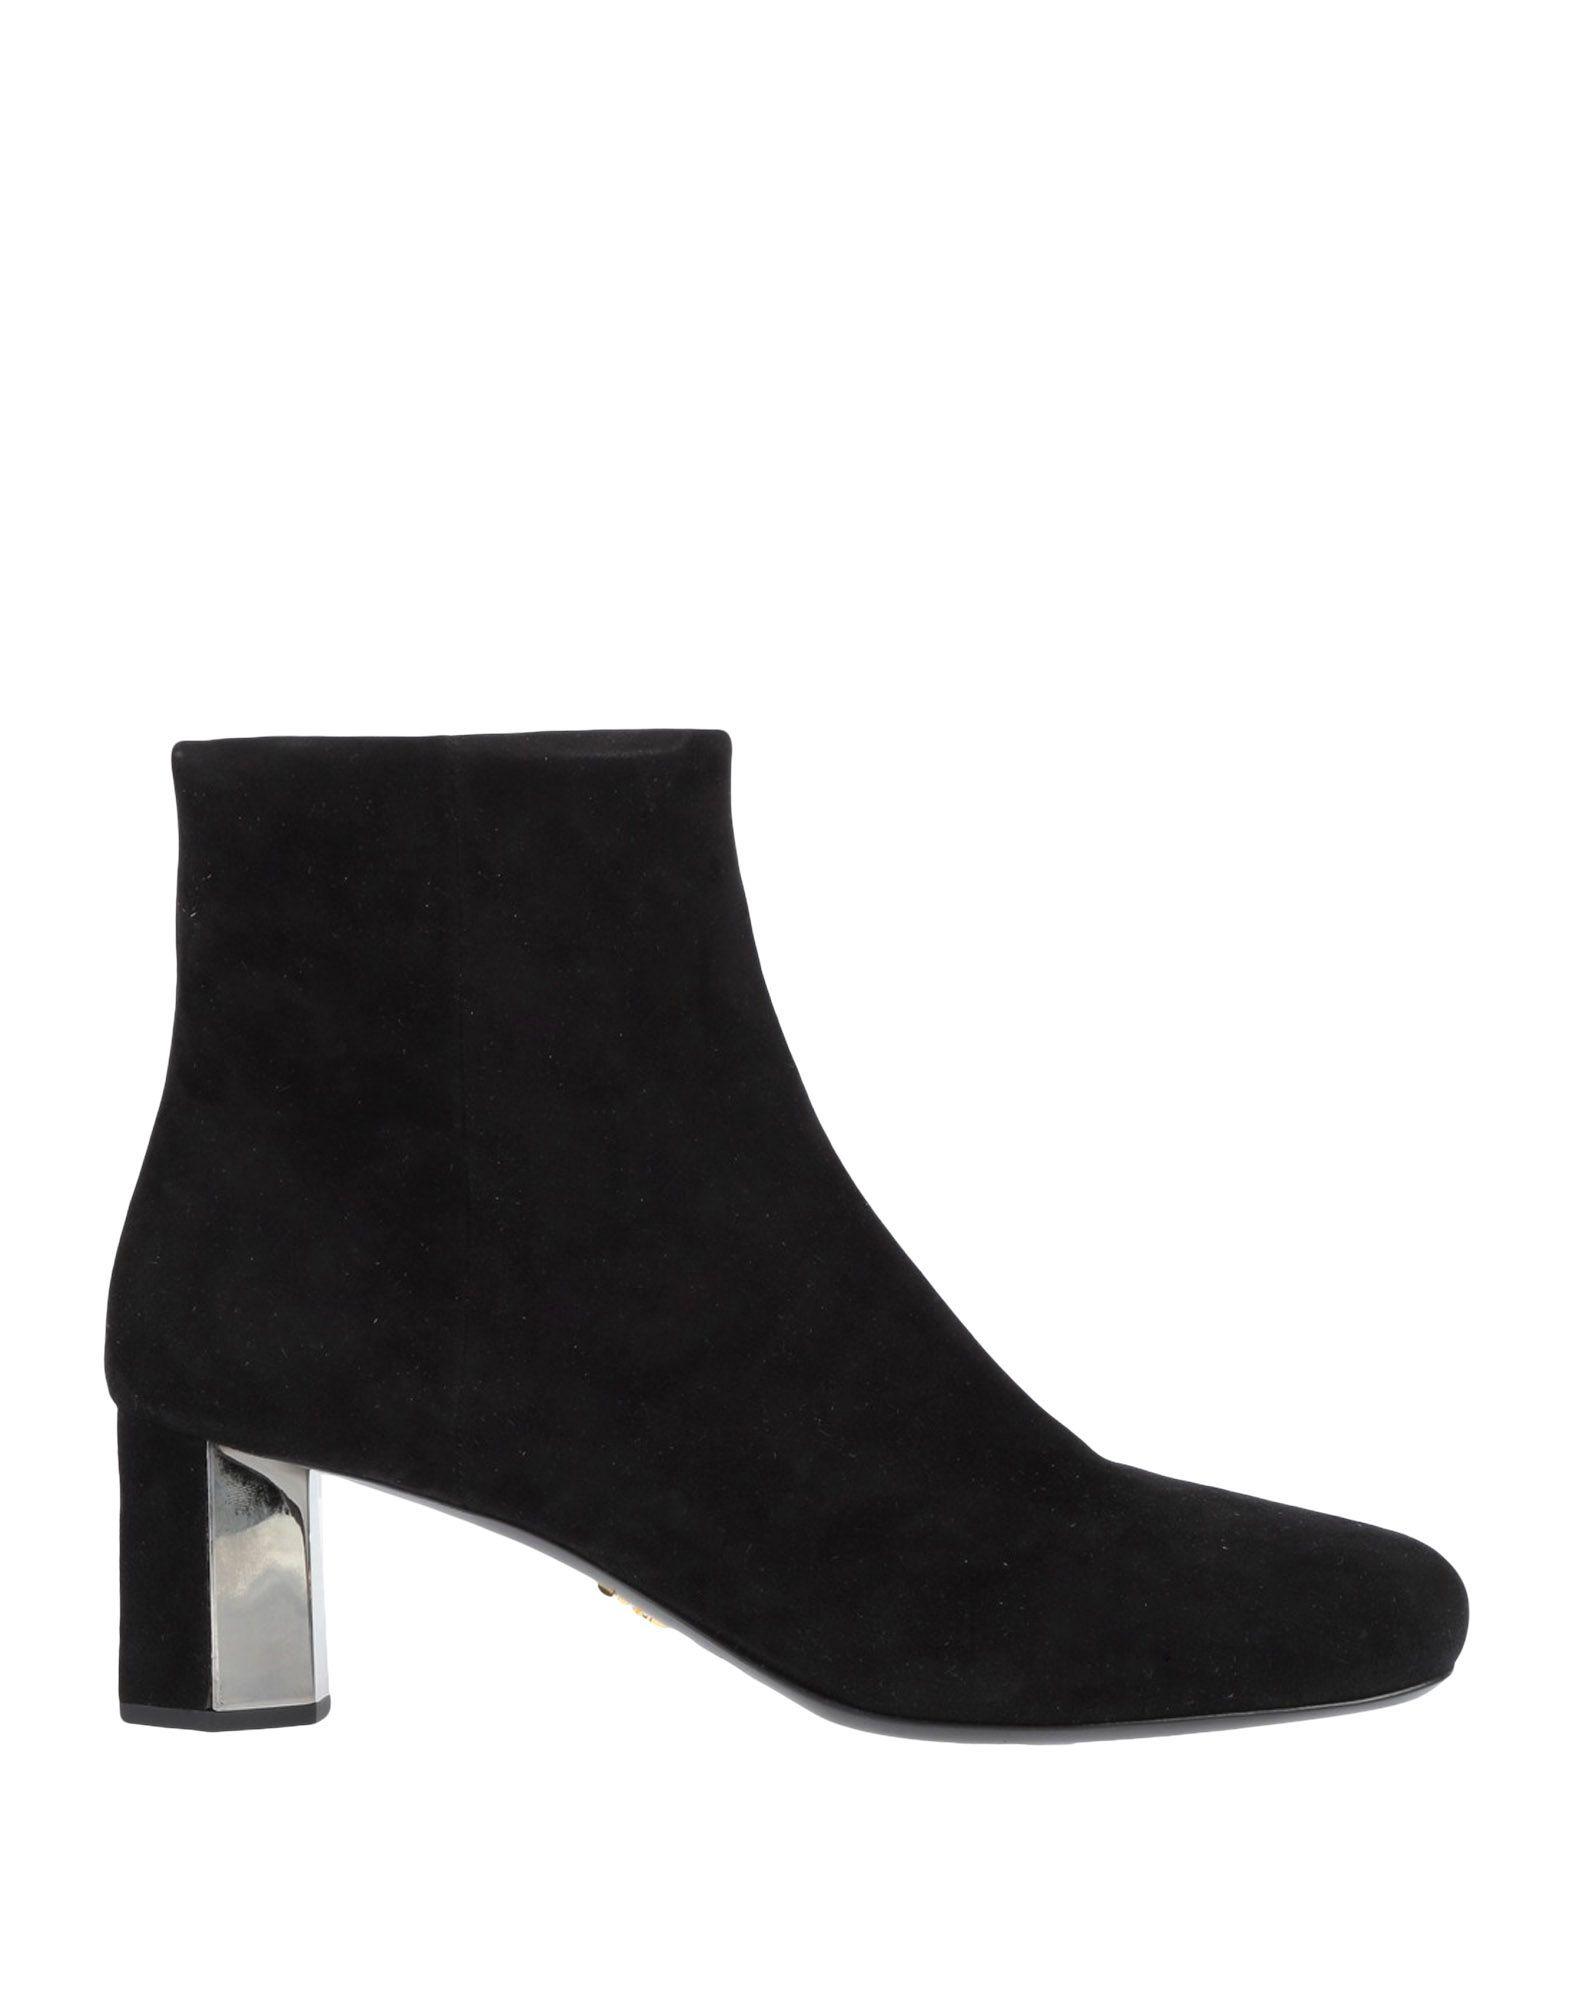 Prada Ankle Boot - Women on Prada Ankle Boots online on Women  United Kingdom - 11522109AD e379f9